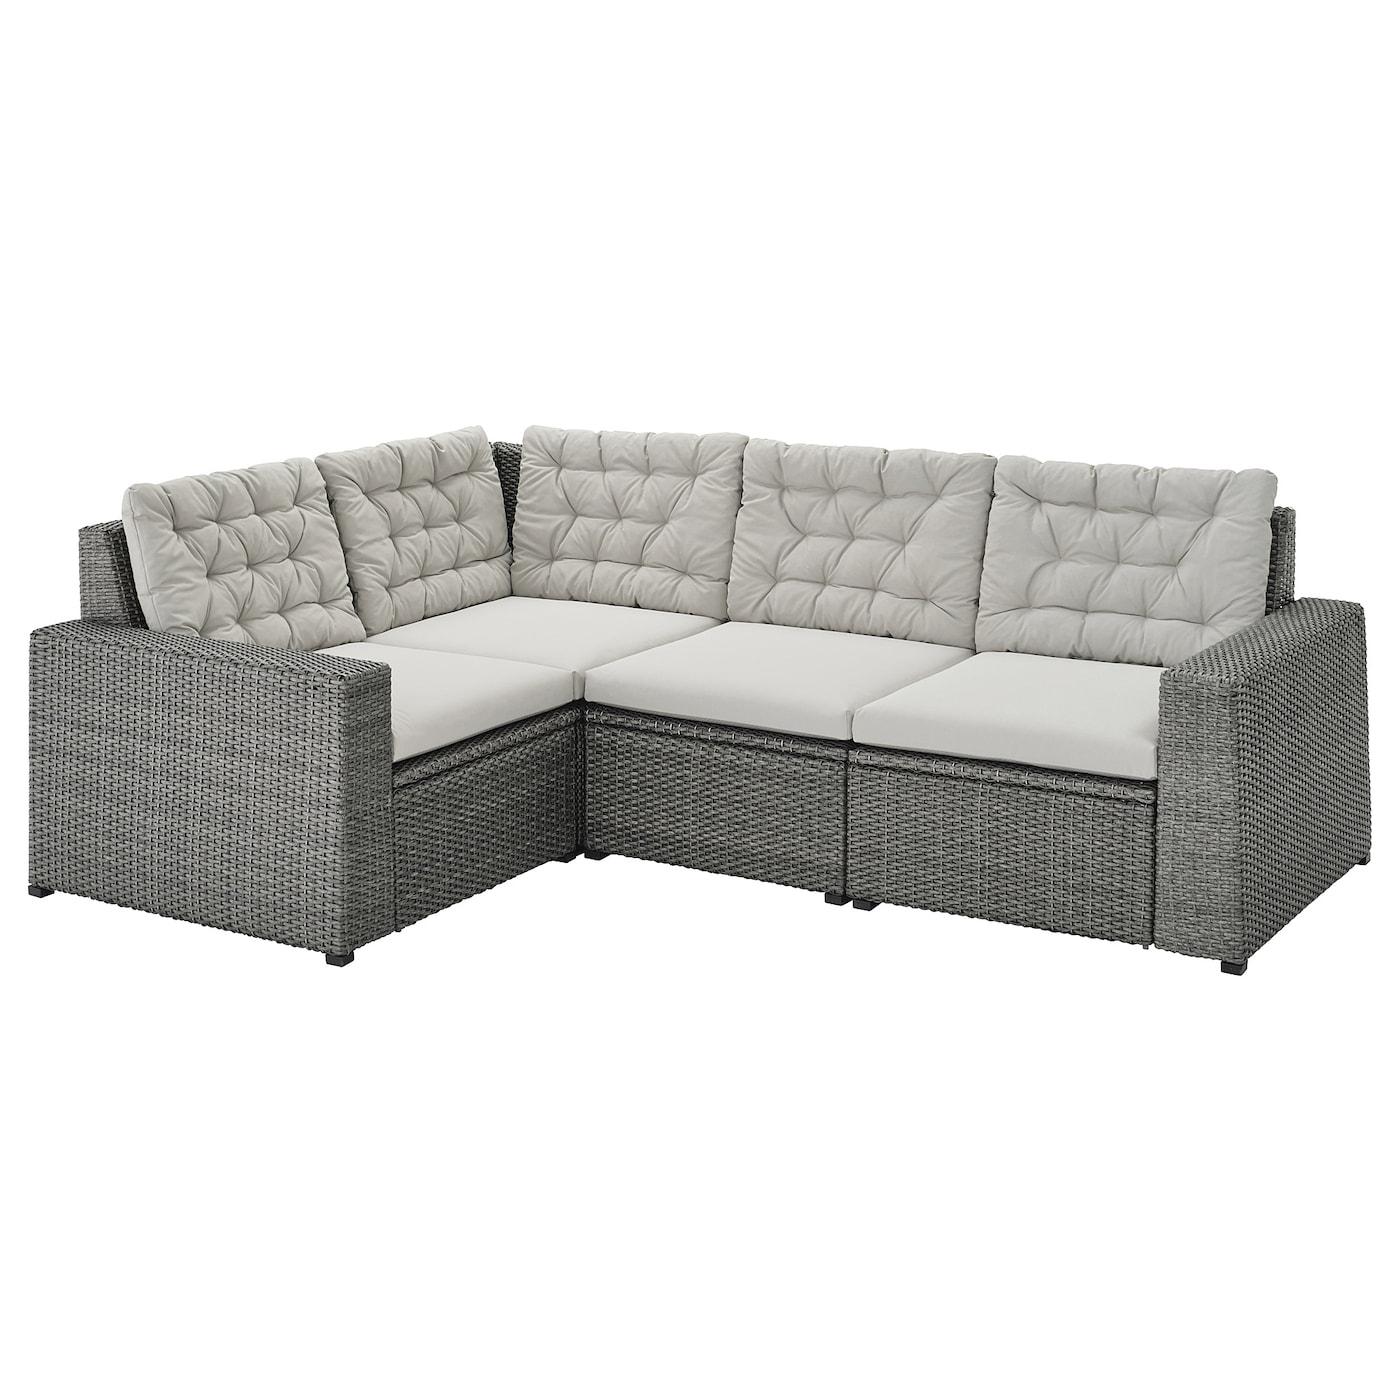 Sollerön Modular Corner Sofa 3 Seat, Outdoor – Dark Grey With Modular Corner Sofas (View 2 of 15)